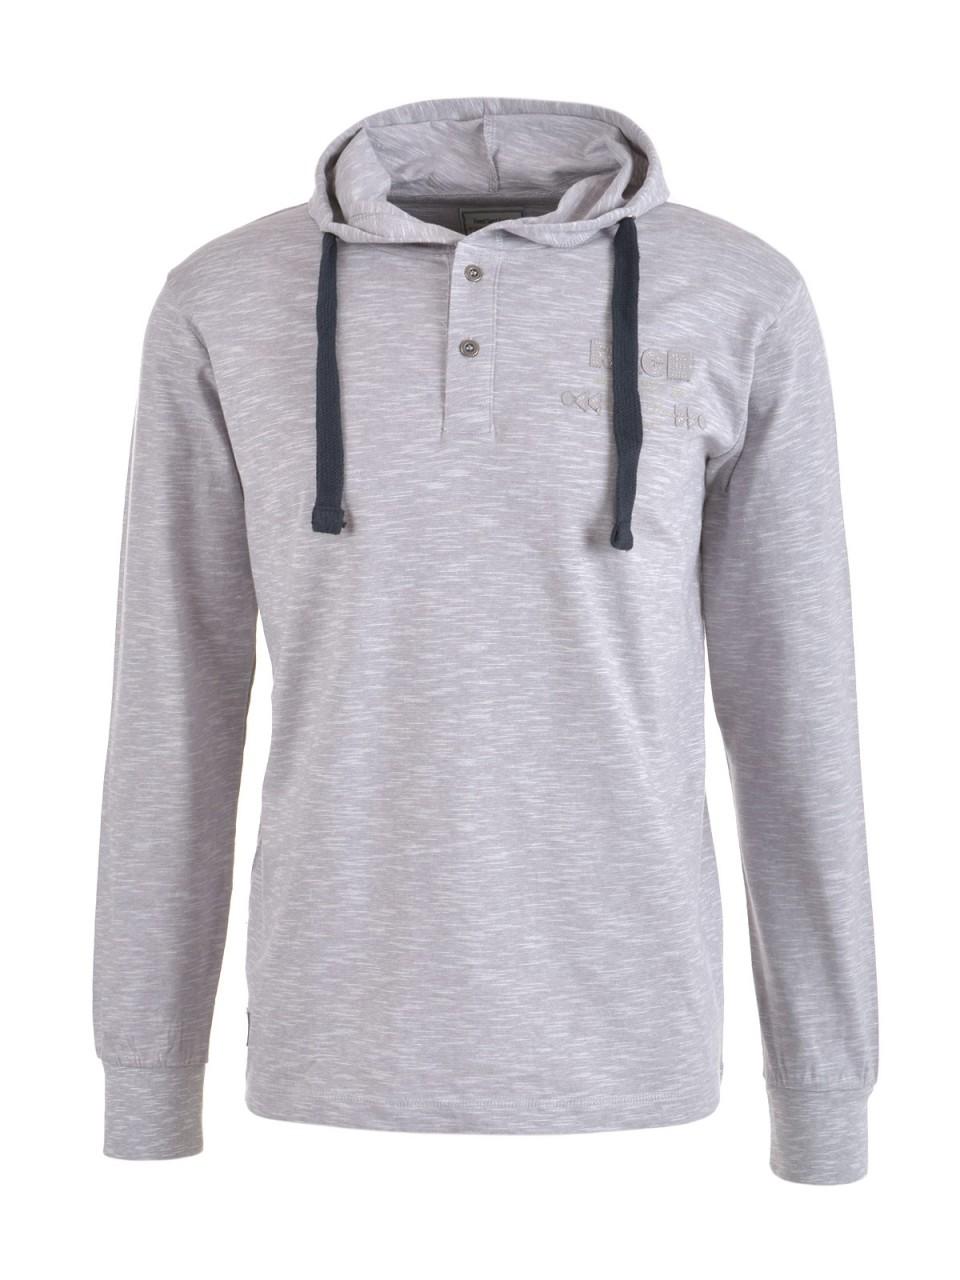 milano-italy-herren-sweatshirt-grau, 25.17 EUR @ designermode-com-mode